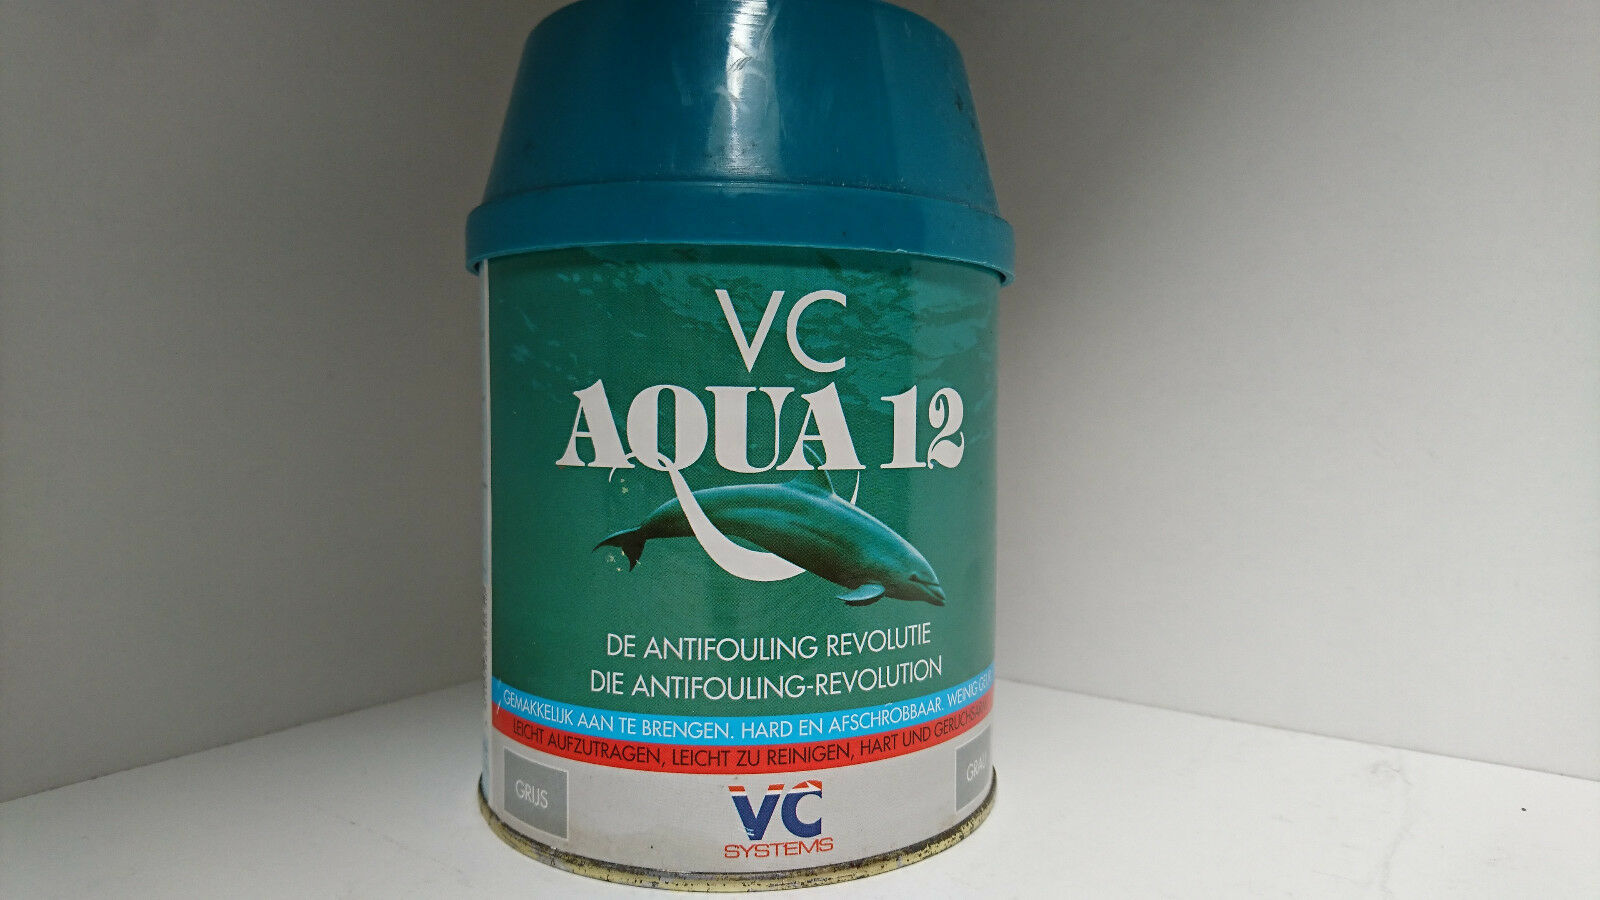 ( /L) Internatinal VC Aqua 12 Antifouling 1L